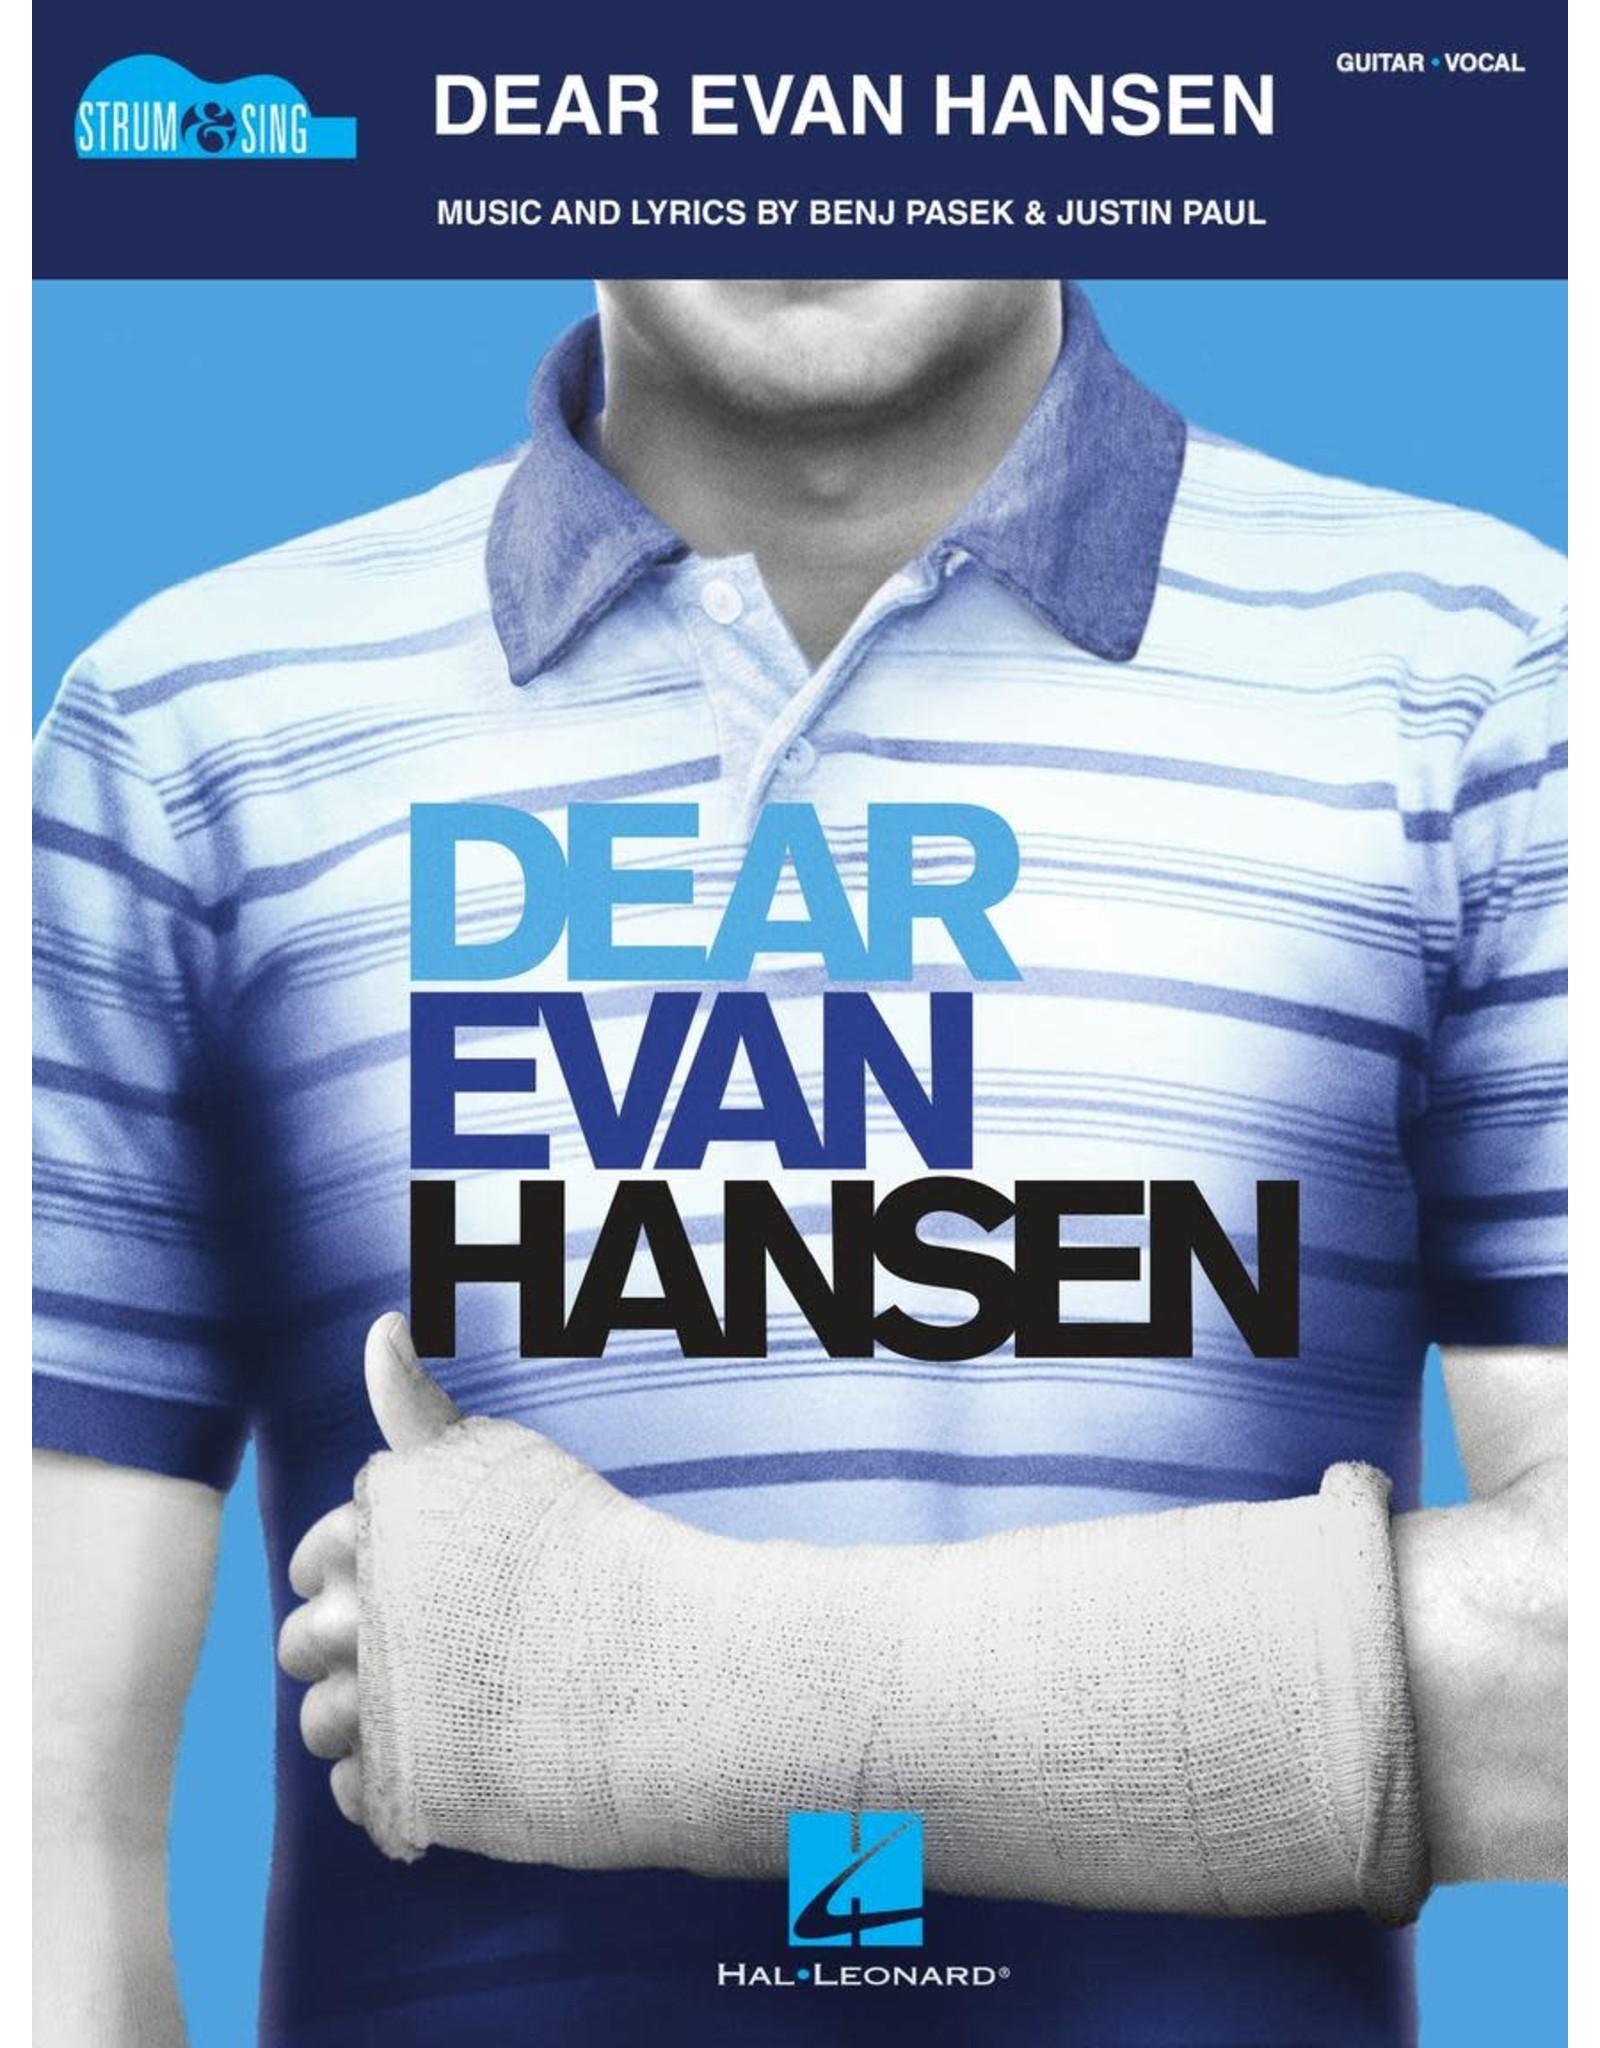 Hal Leonard Dear Evan Hansen - Strum & Sing Guitar